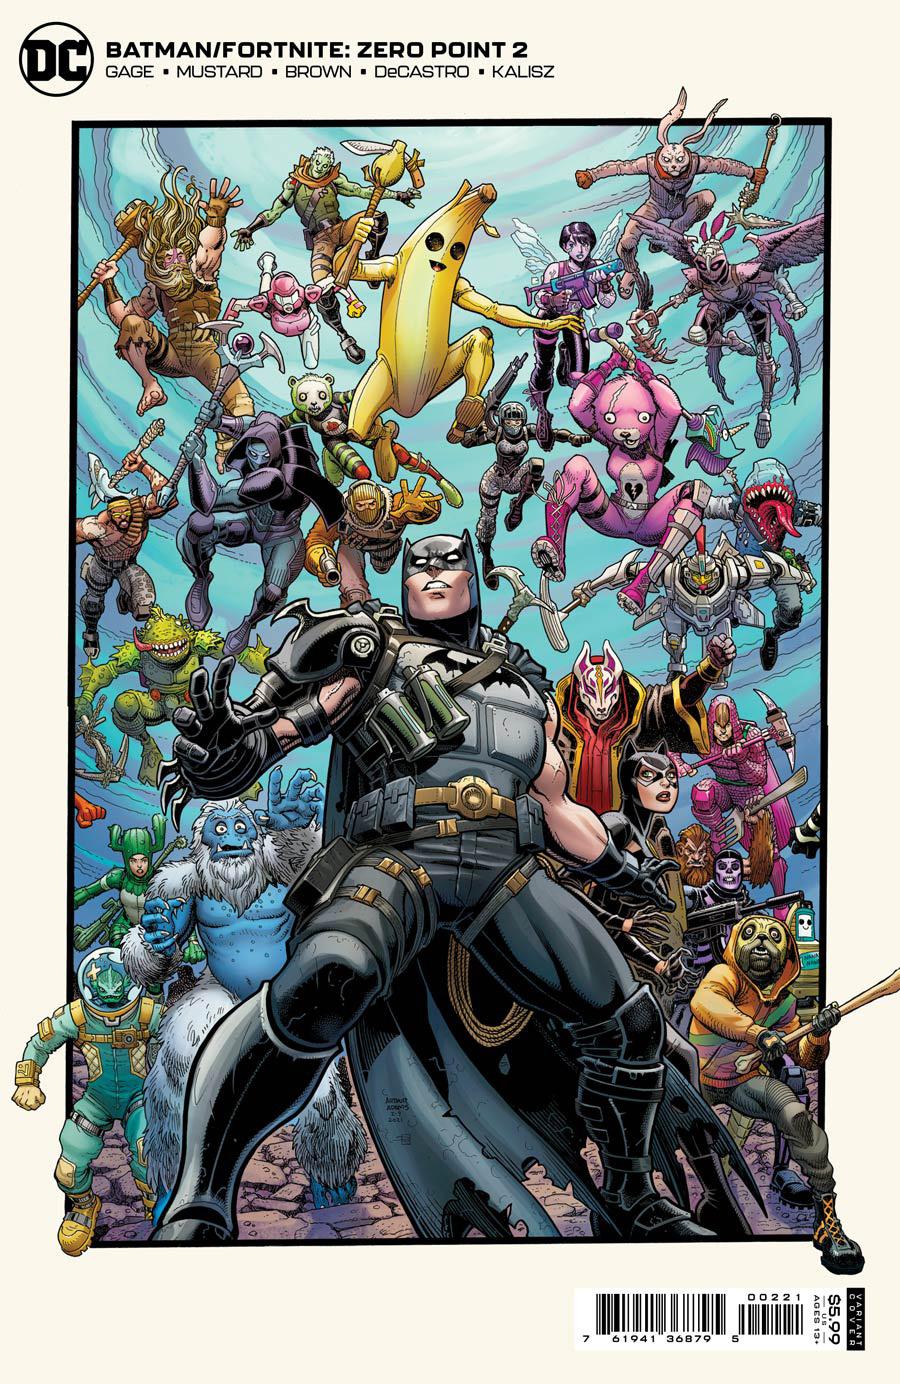 Batman Fortnite Zero Point #2 Cover B Variant Arthur Adams Card Stock Cover